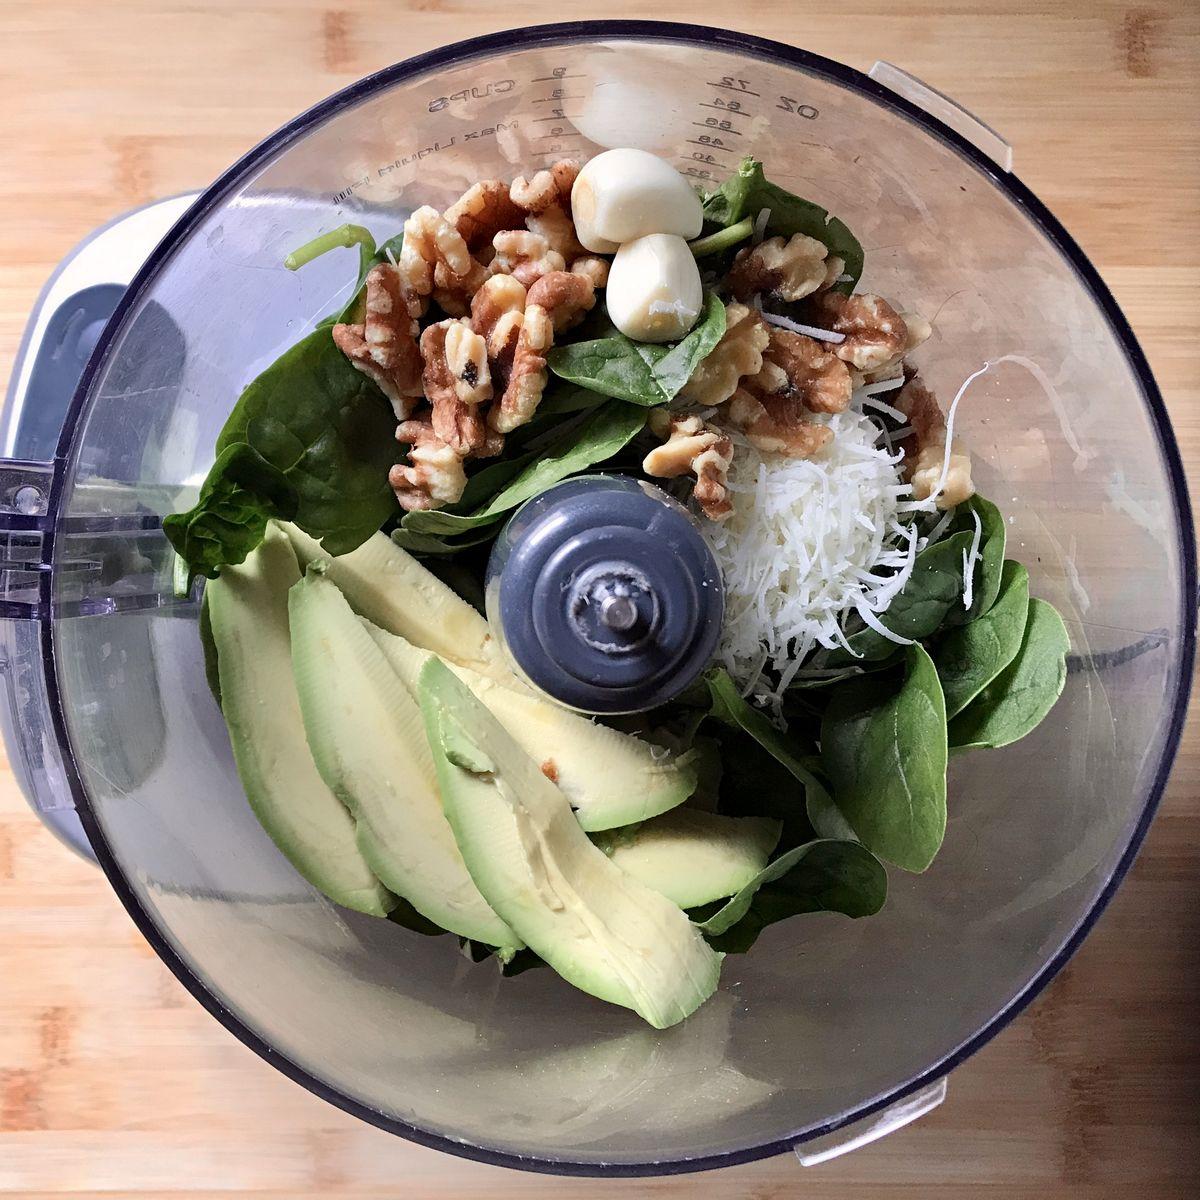 The ingredients for the Avocado Pesto Cavatelli Pasta Recipe are in a food processor.